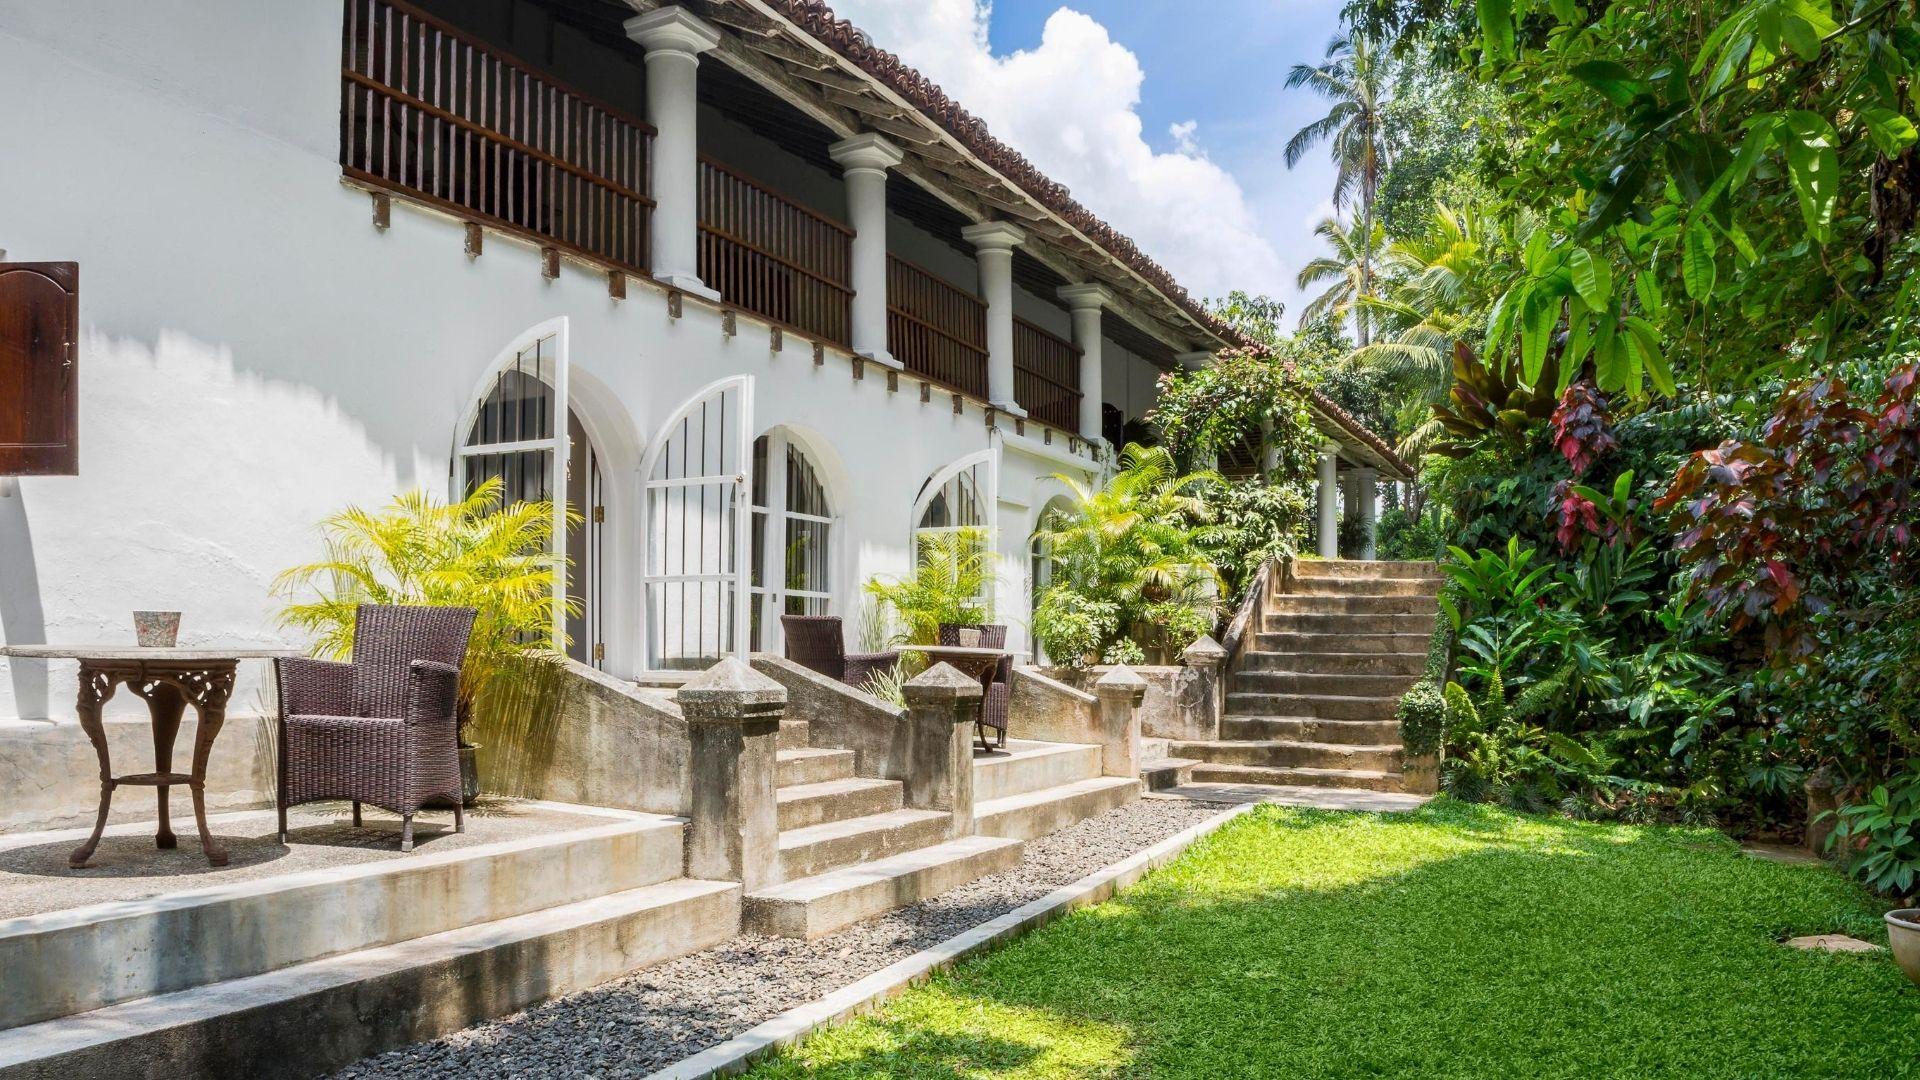 The Kandy House, Sri Lanka